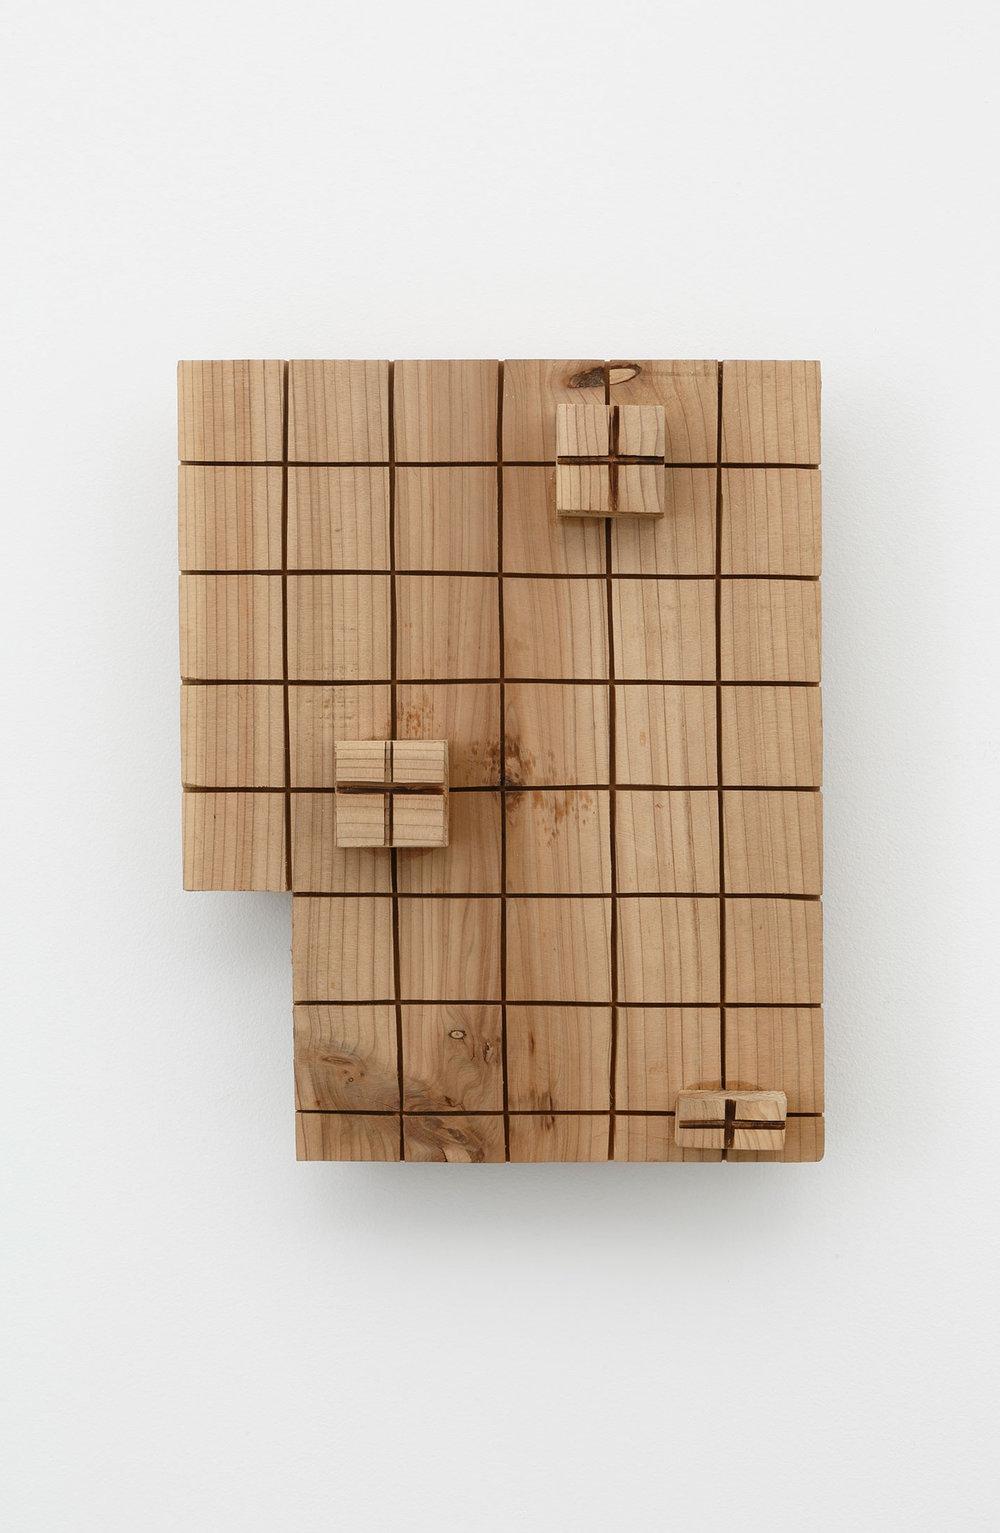 Lateral Borders , 2000 側境 ( Sokkyō ) Wood 11 11/16 x 9 1/2 x 3 1/2 inches 29.7 x 24 x 9 centimeters